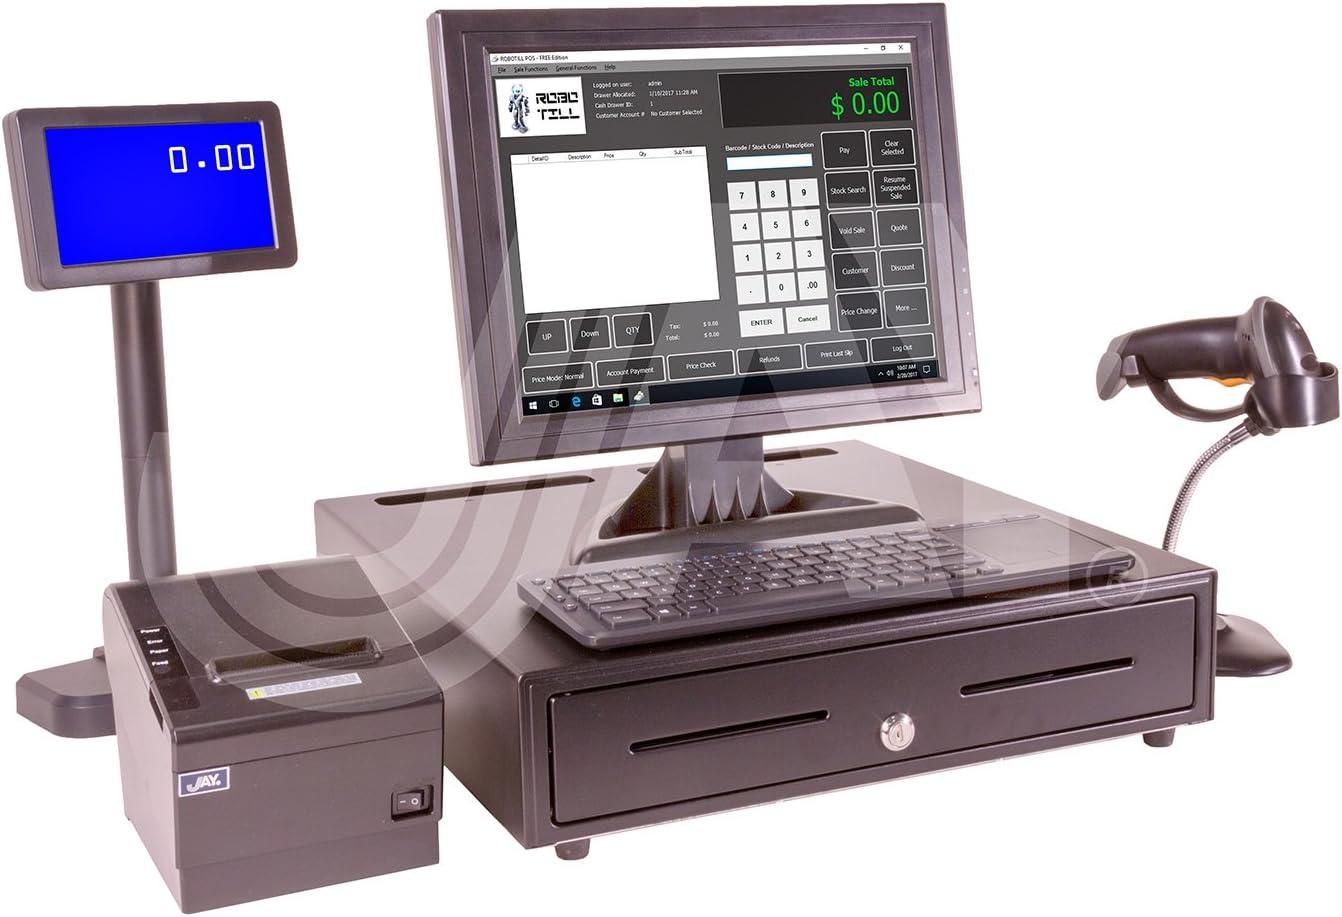 Jay Premium POS System pkg #1121. New DELL Optiplex 3050 Micro PC w/Windows 10 Pro 64bit COA + New Peripherals:.Monitor, Drawer, Printer, VFD, Scanner, Keyboard. Request Brochure from Company